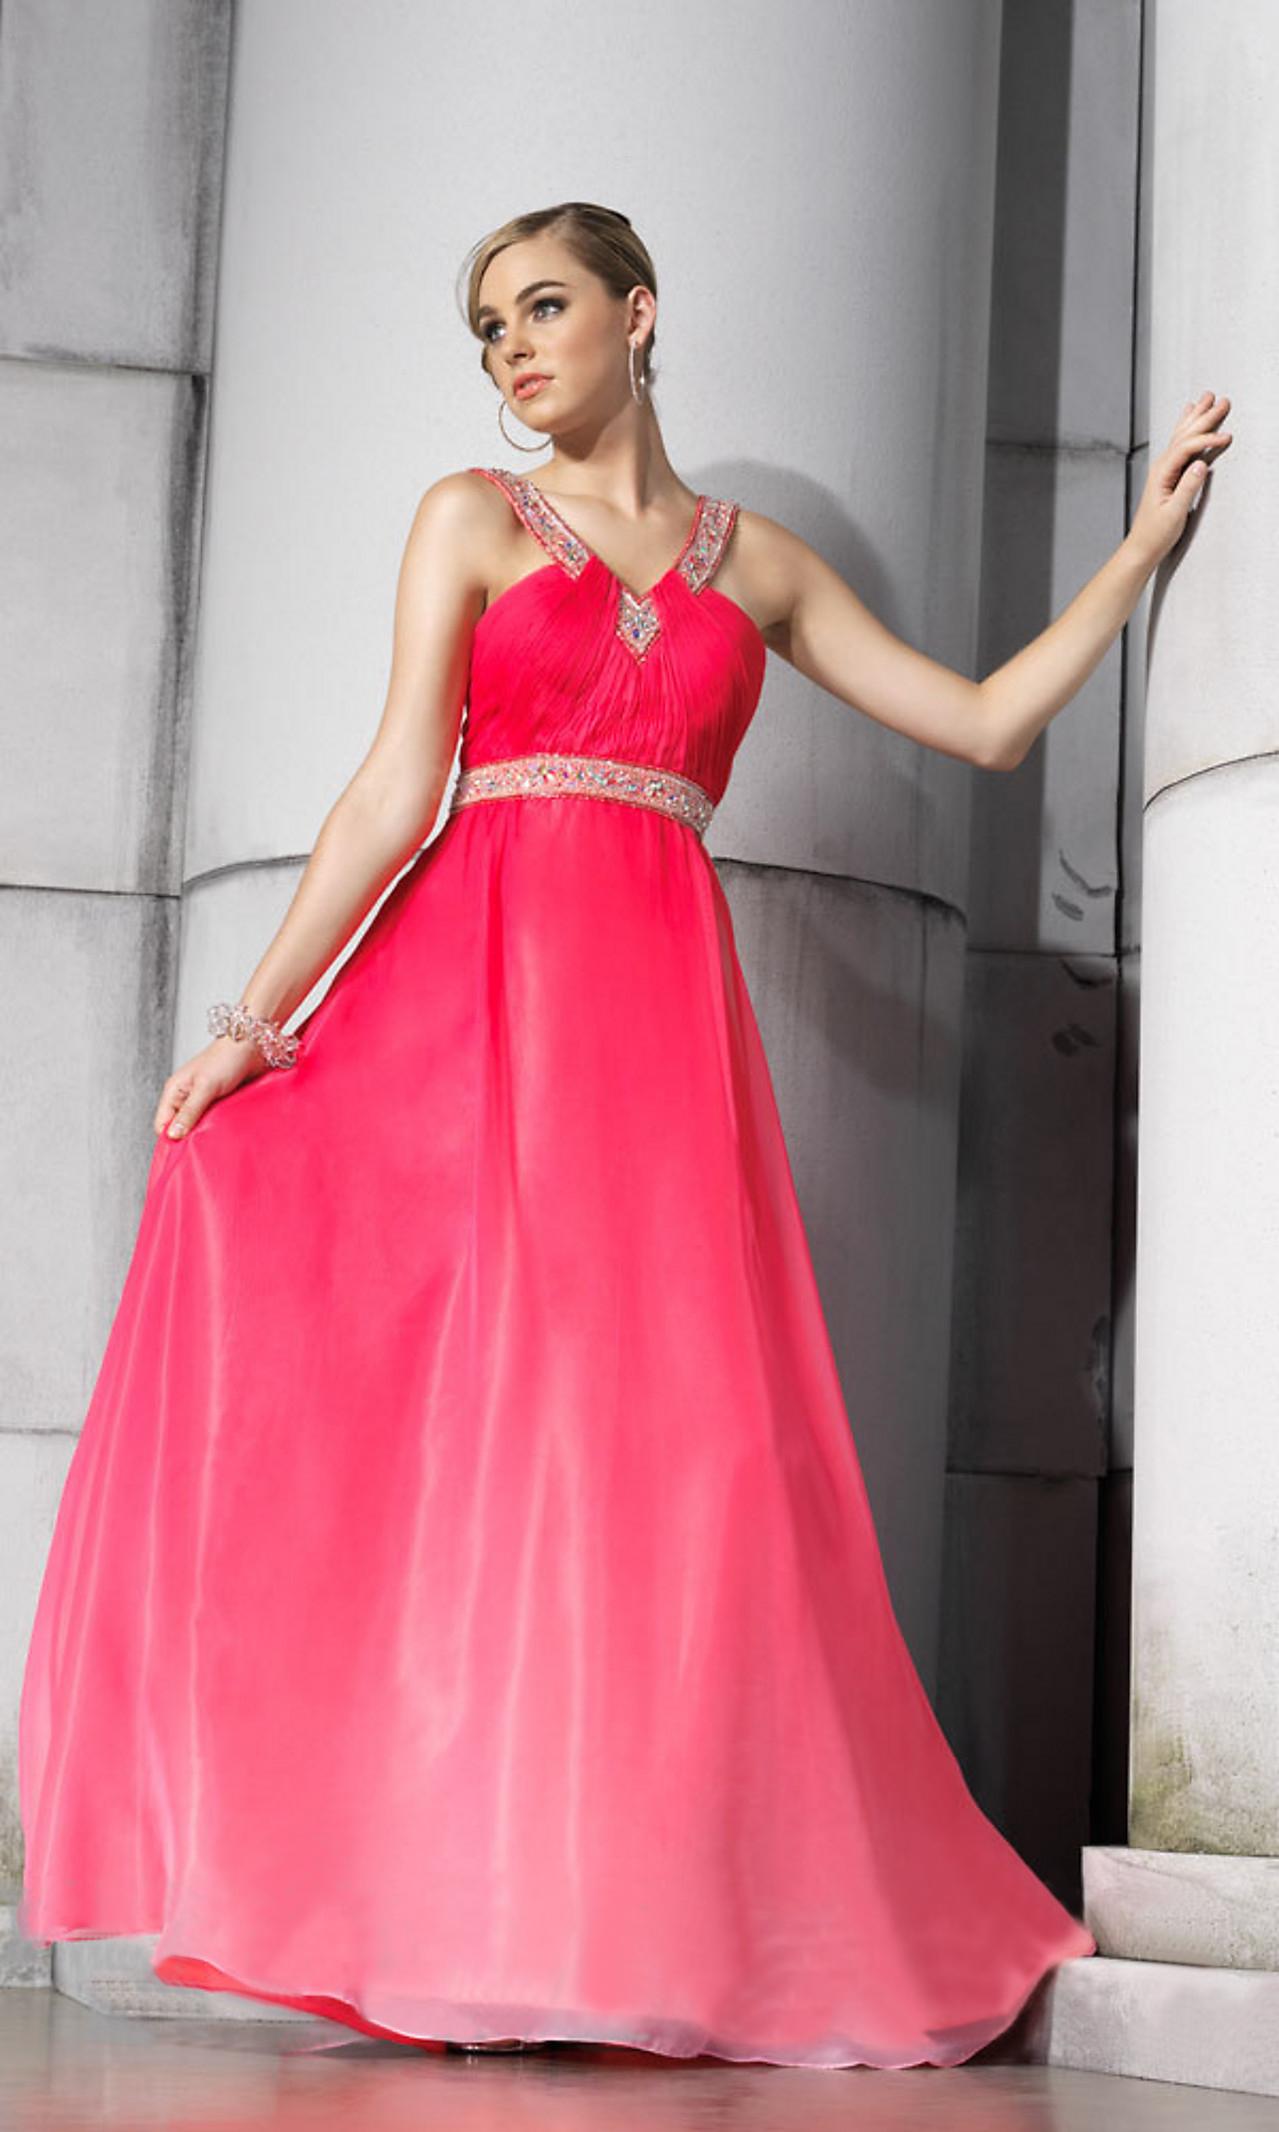 لباس شب 92